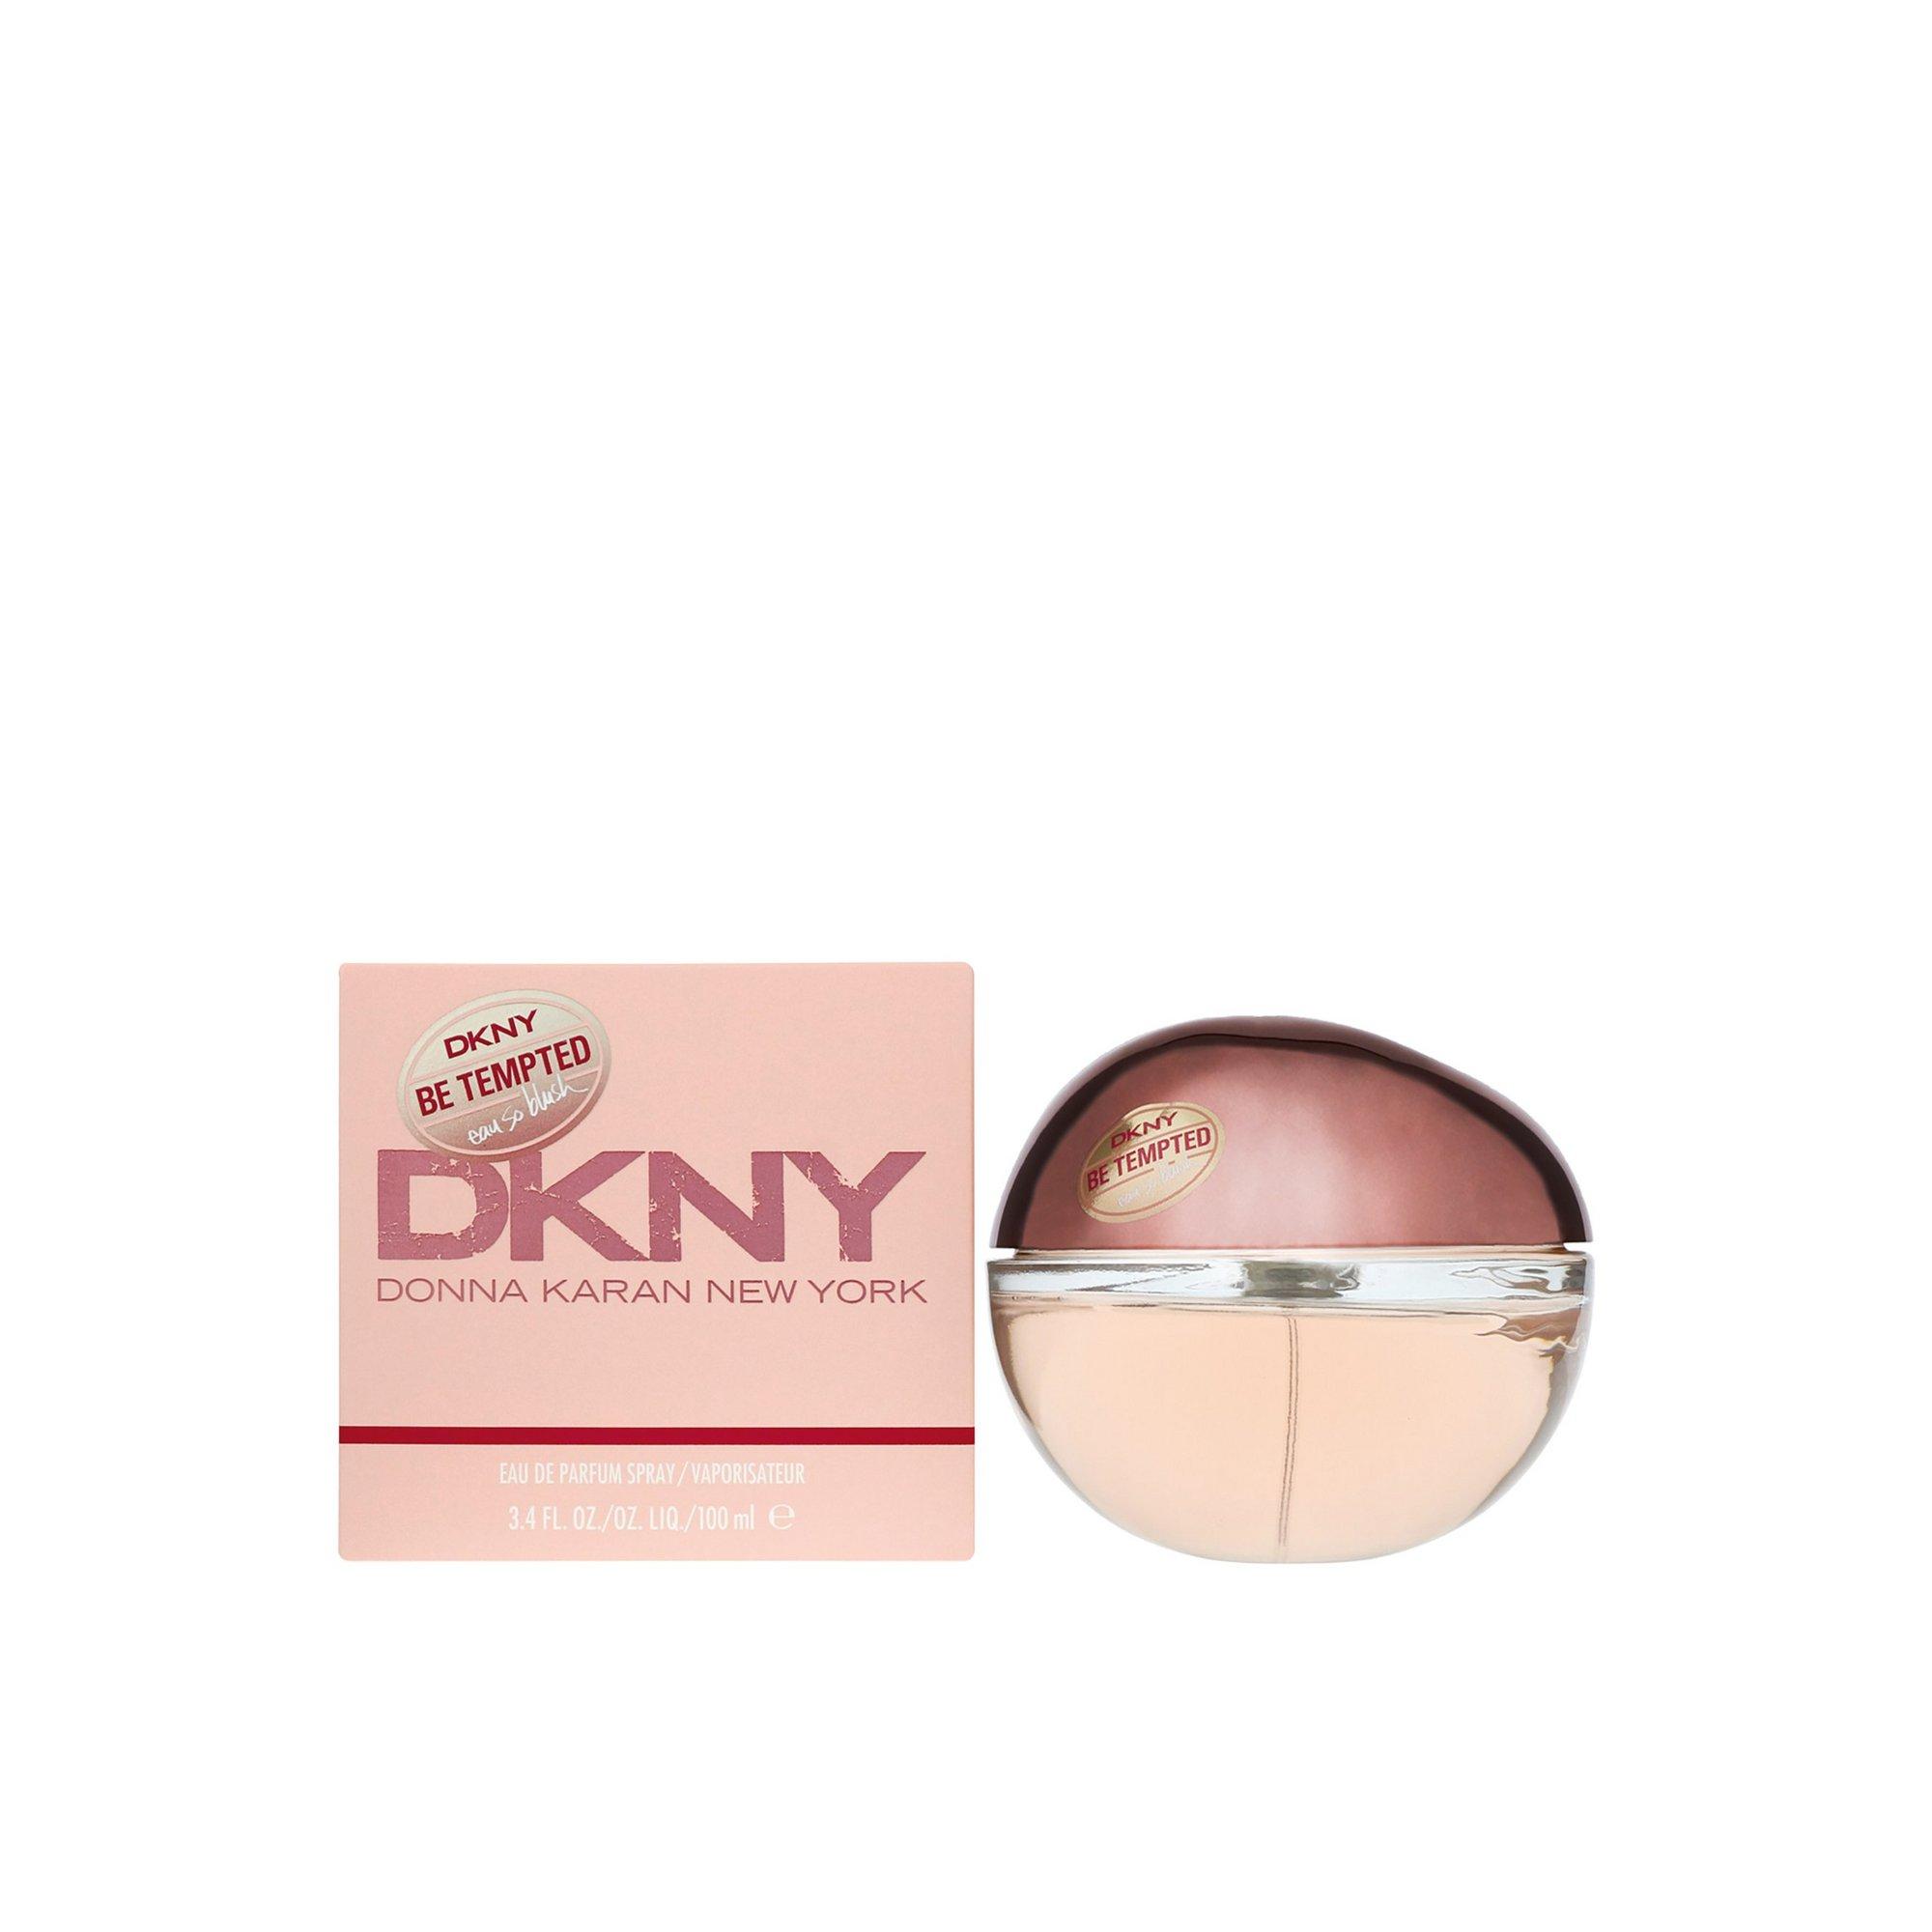 Image of DKNY Be Tempted Eau So Blush 50ml EDP